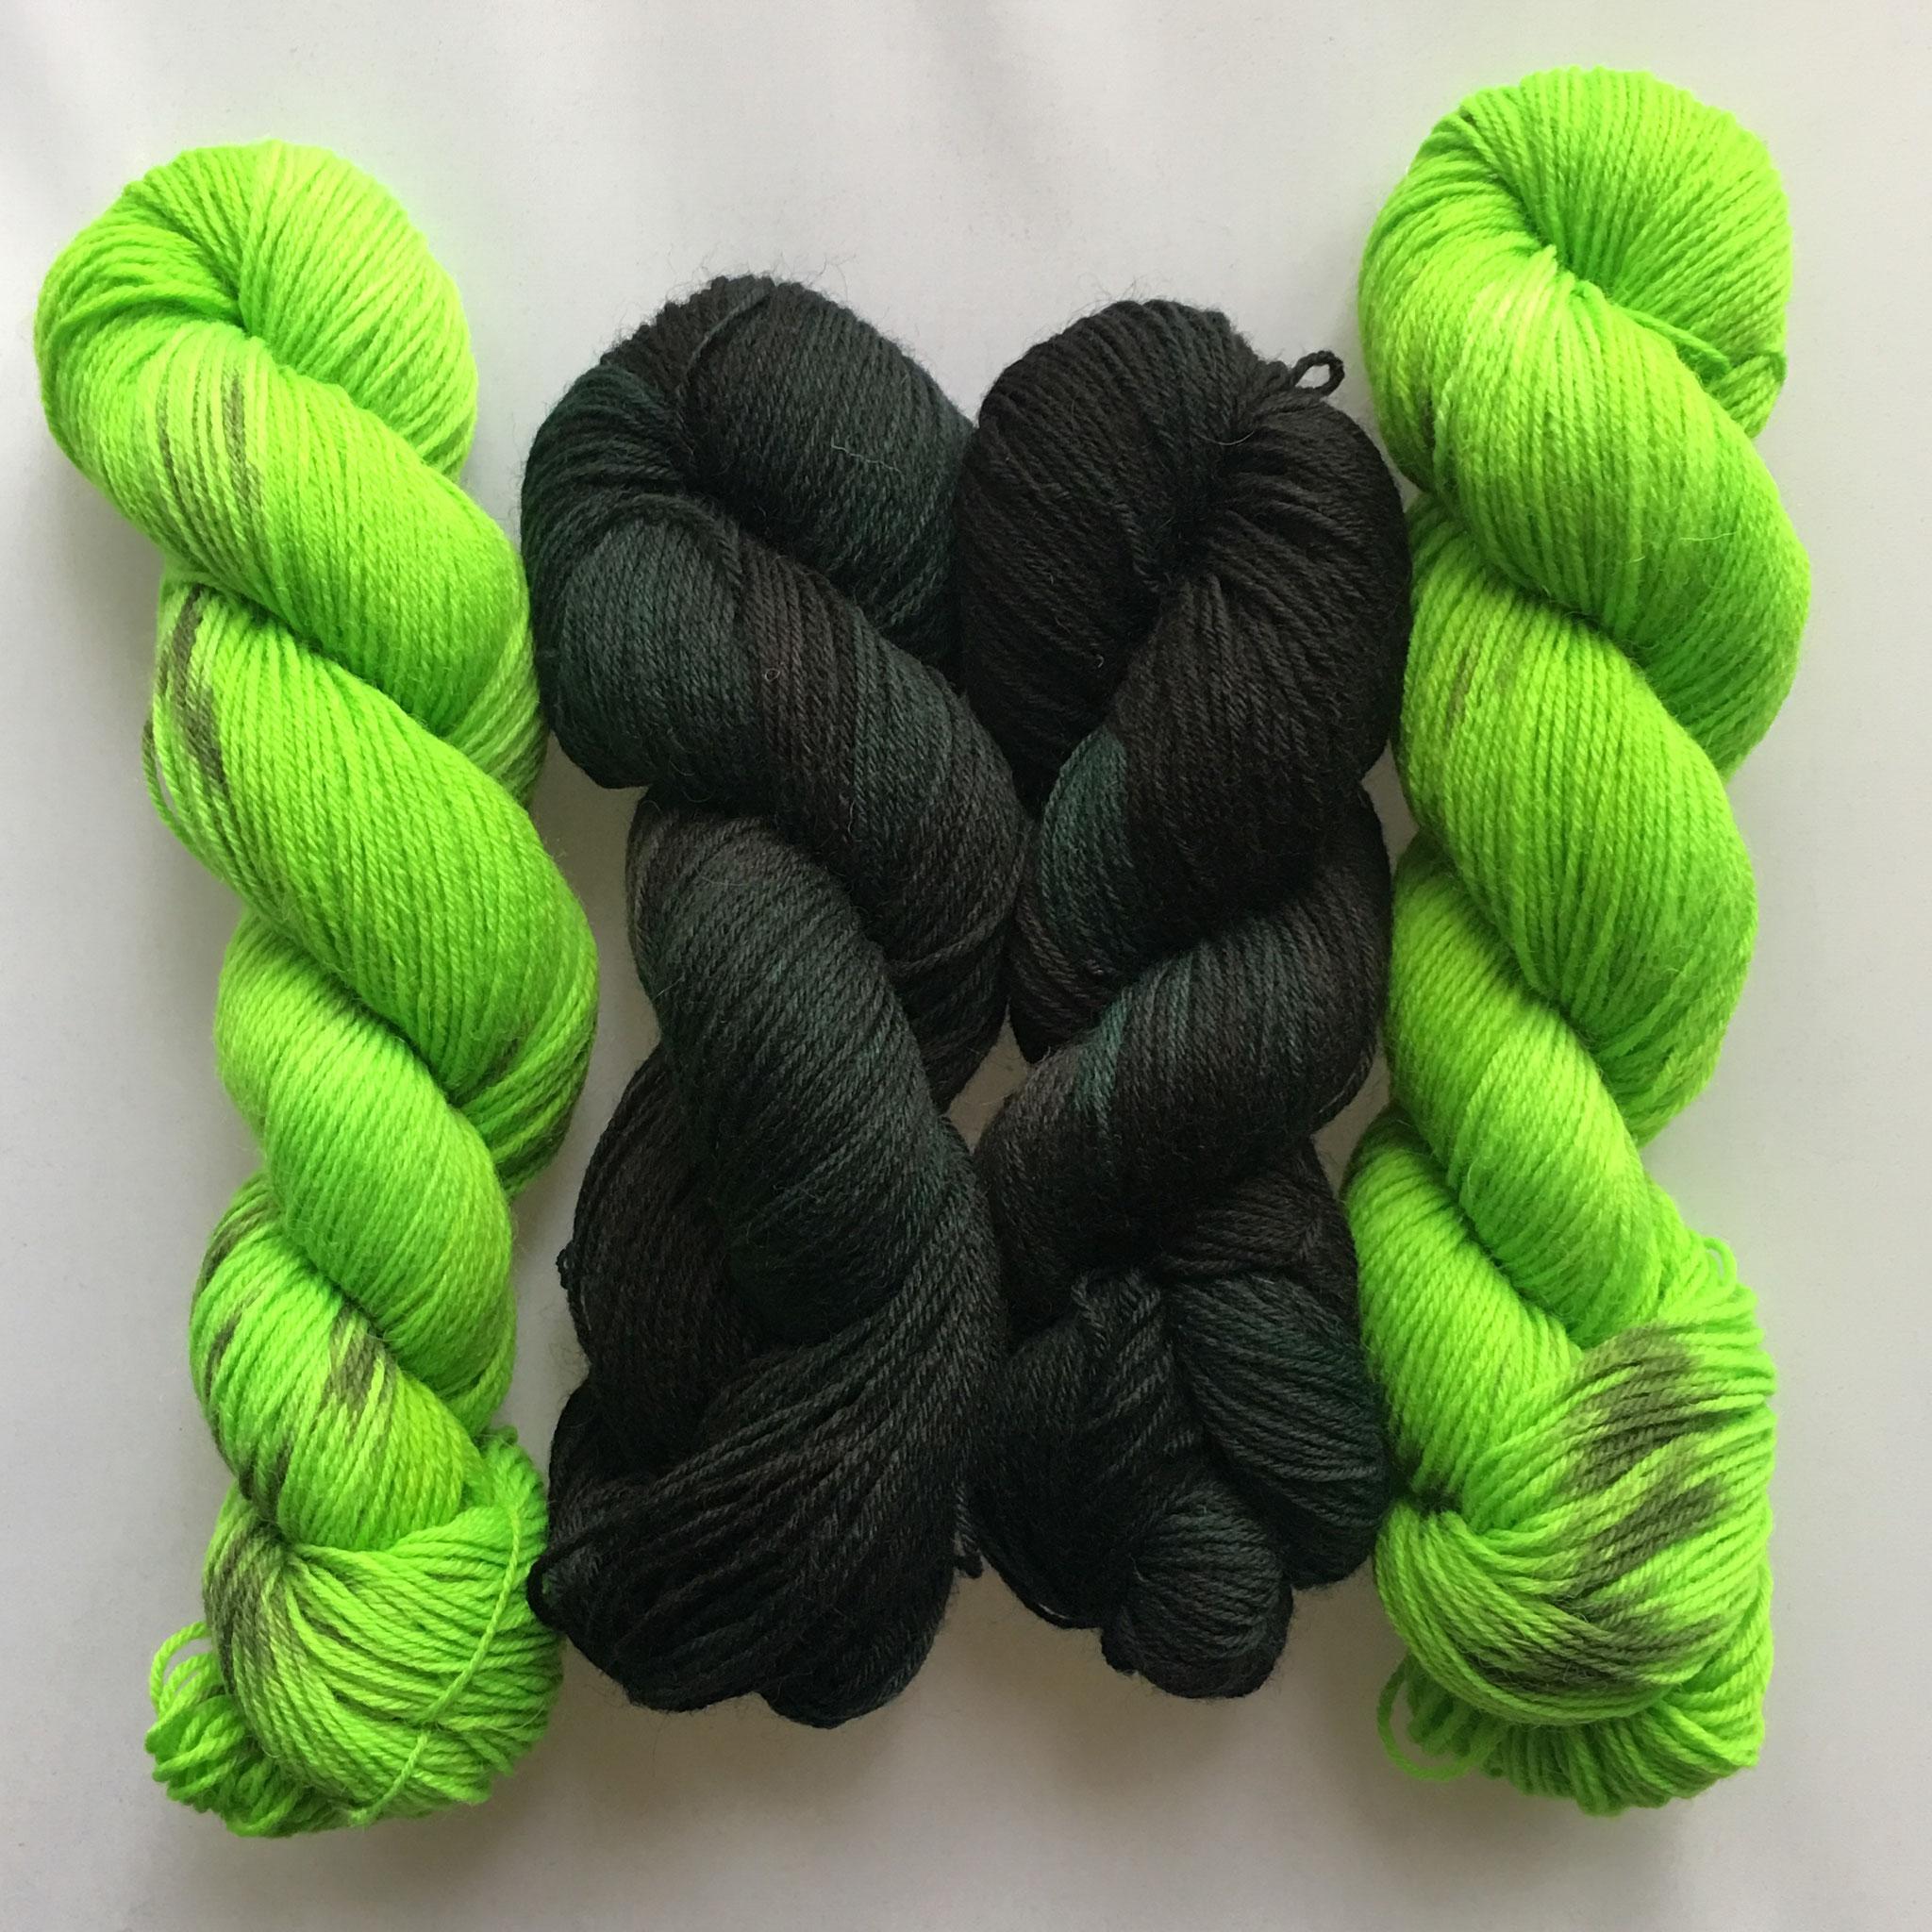 Edelzombie-Garnset | PoshZombie yarn set